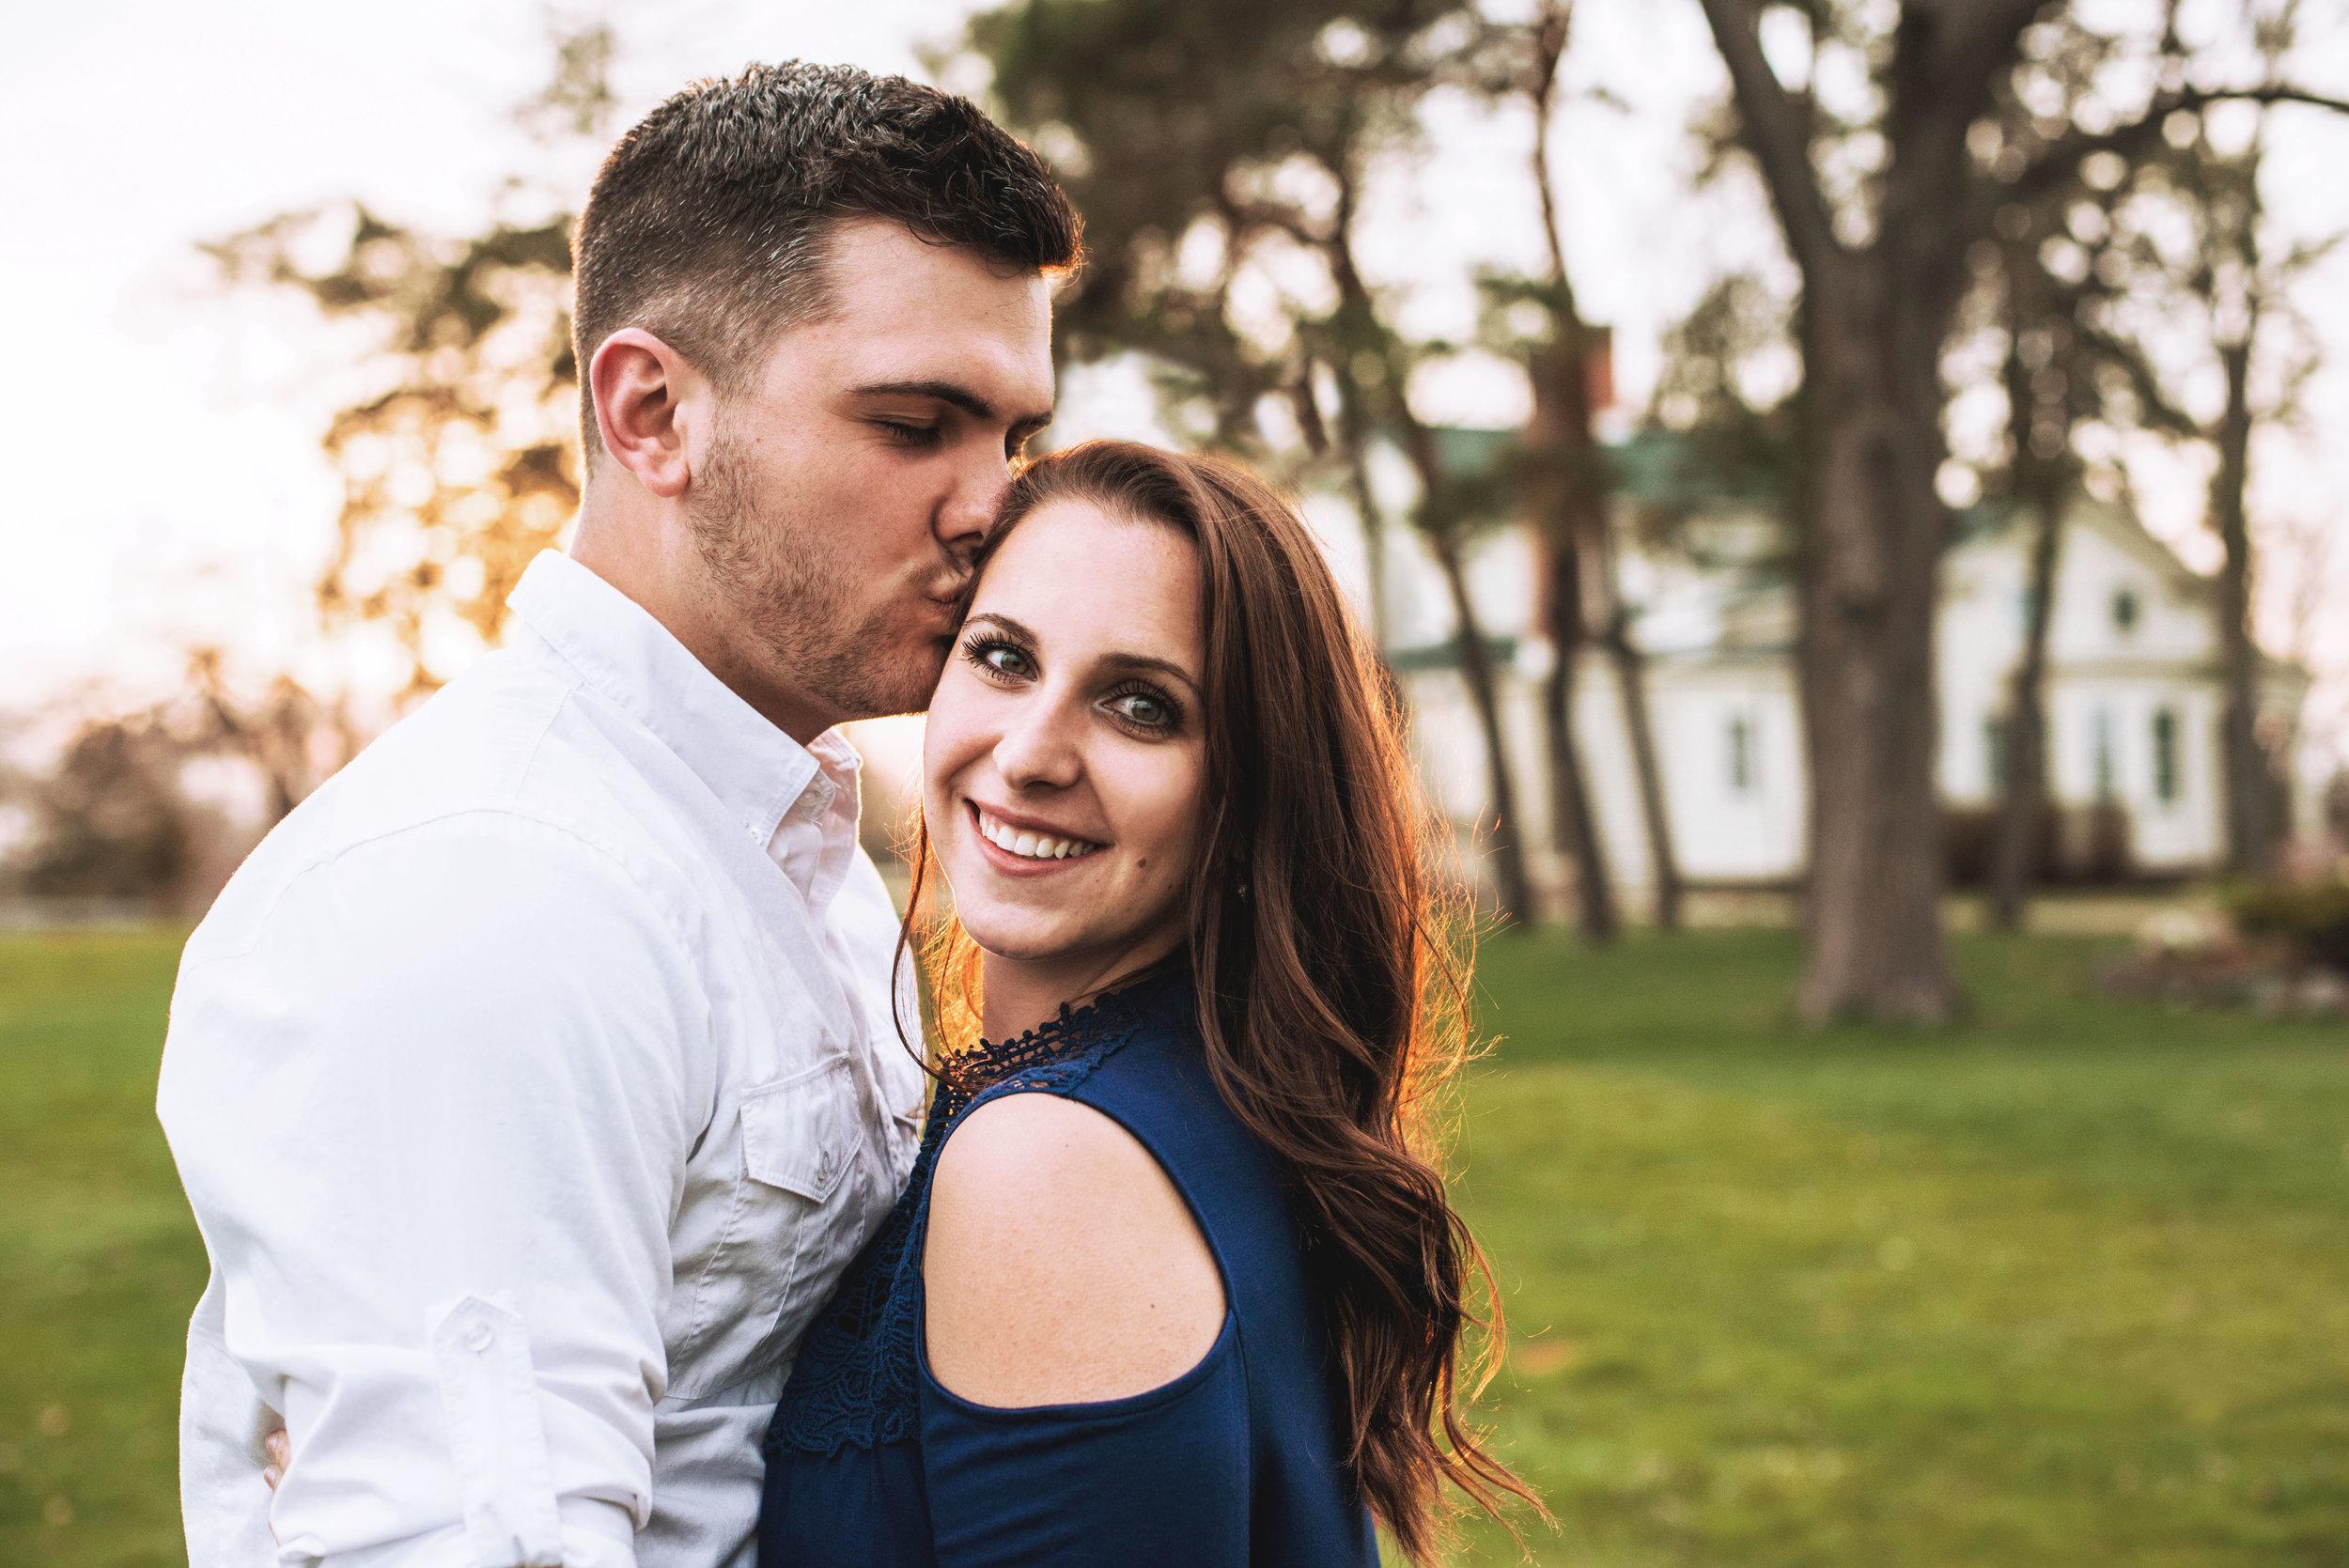 Clayton&Gina_Engagement-11.jpg